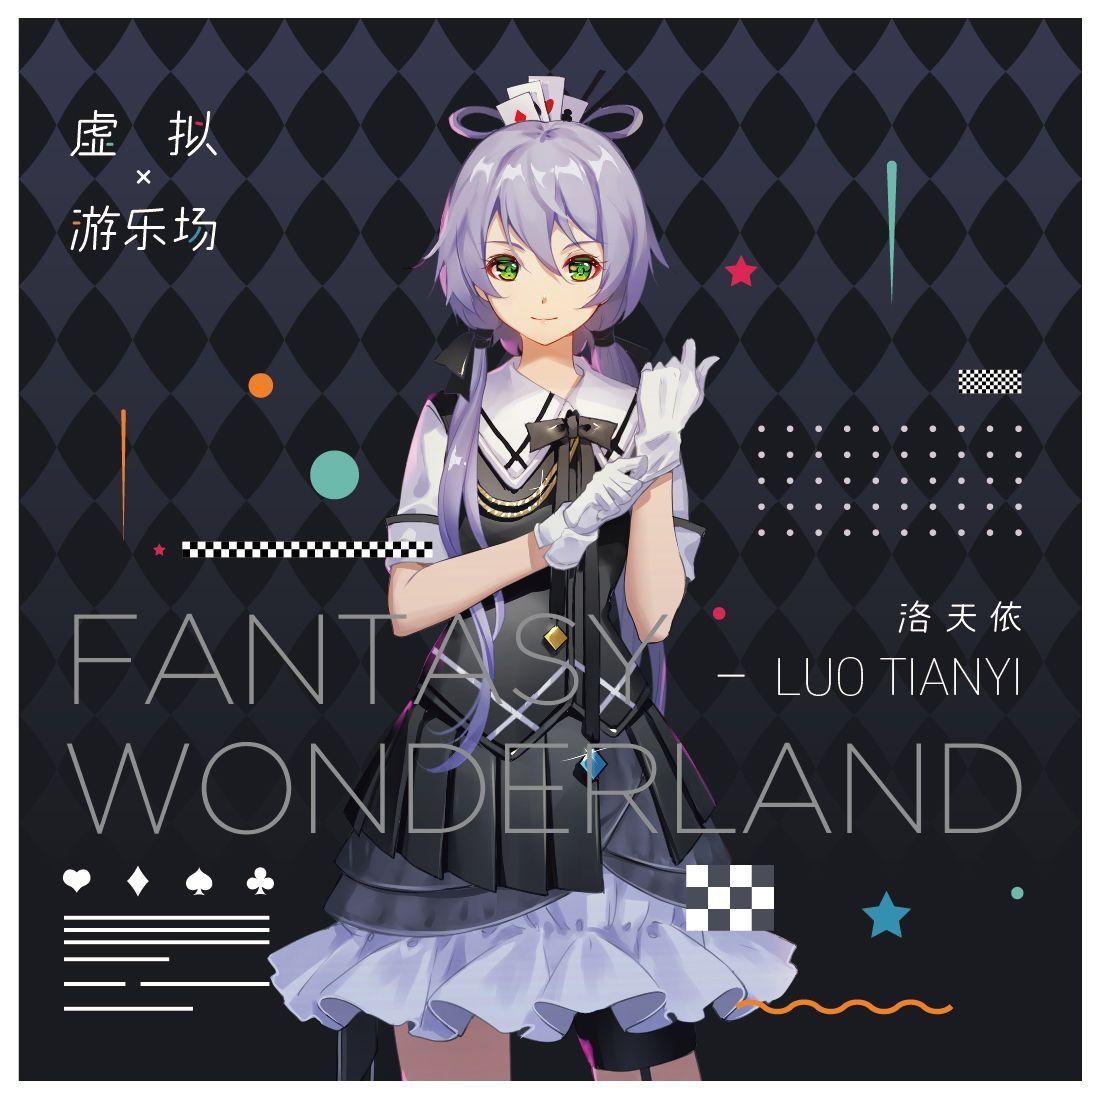 洛天依-Luo TianYi Vocaloid